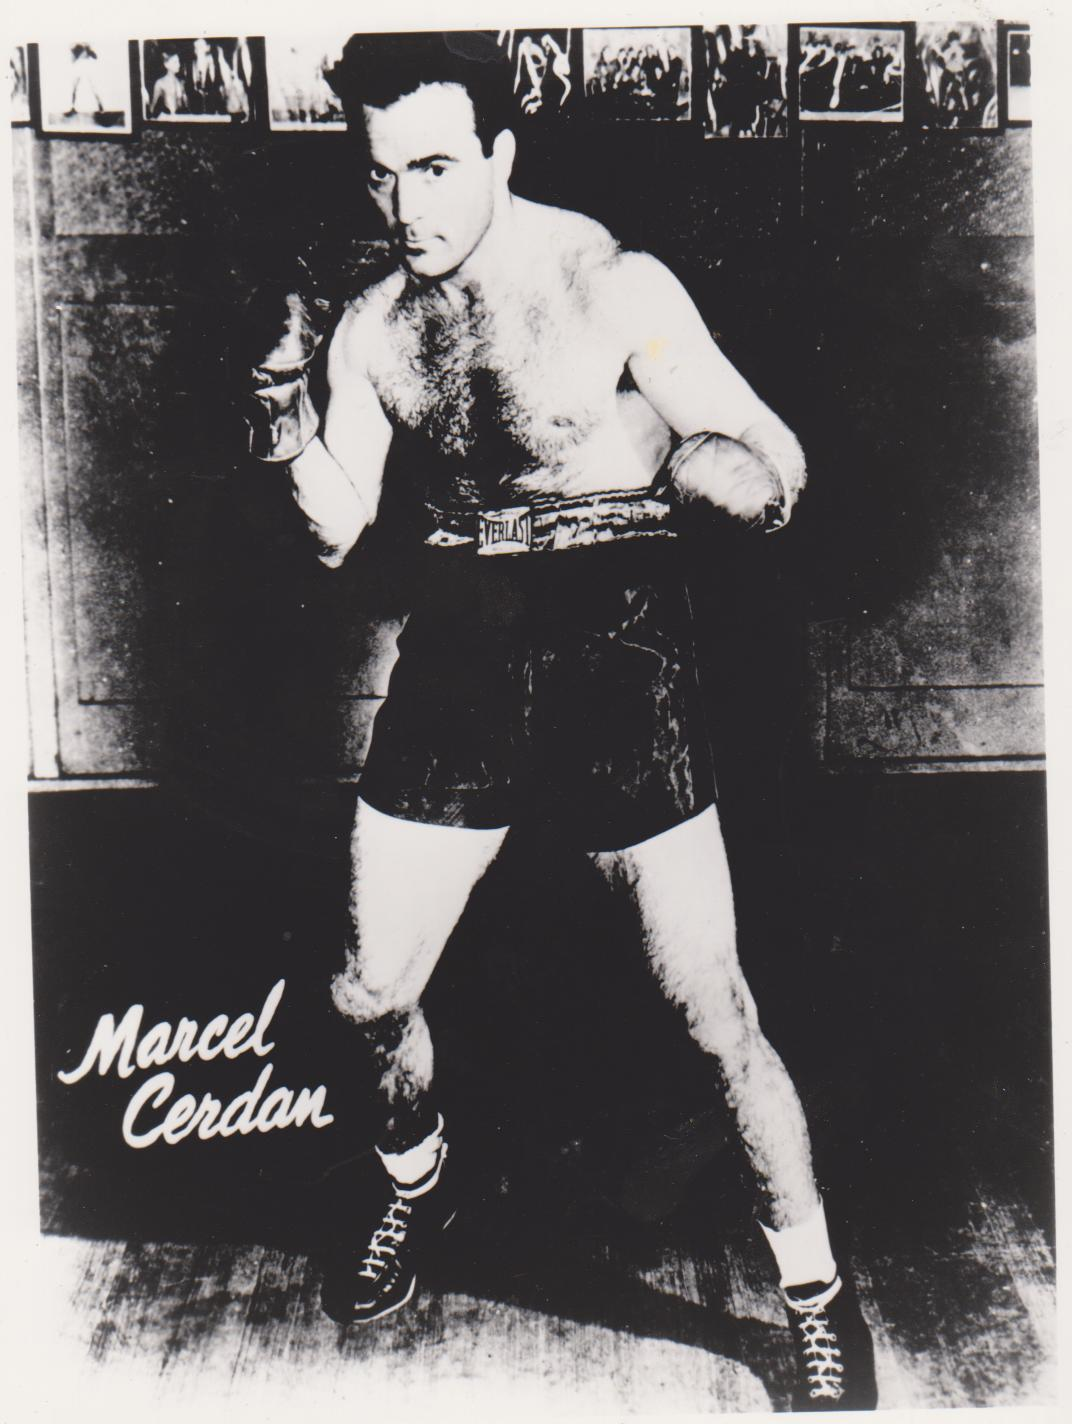 Marcel Cerdan Vintage 8X10 BW Boxing Memorabilia Photo - $4.99